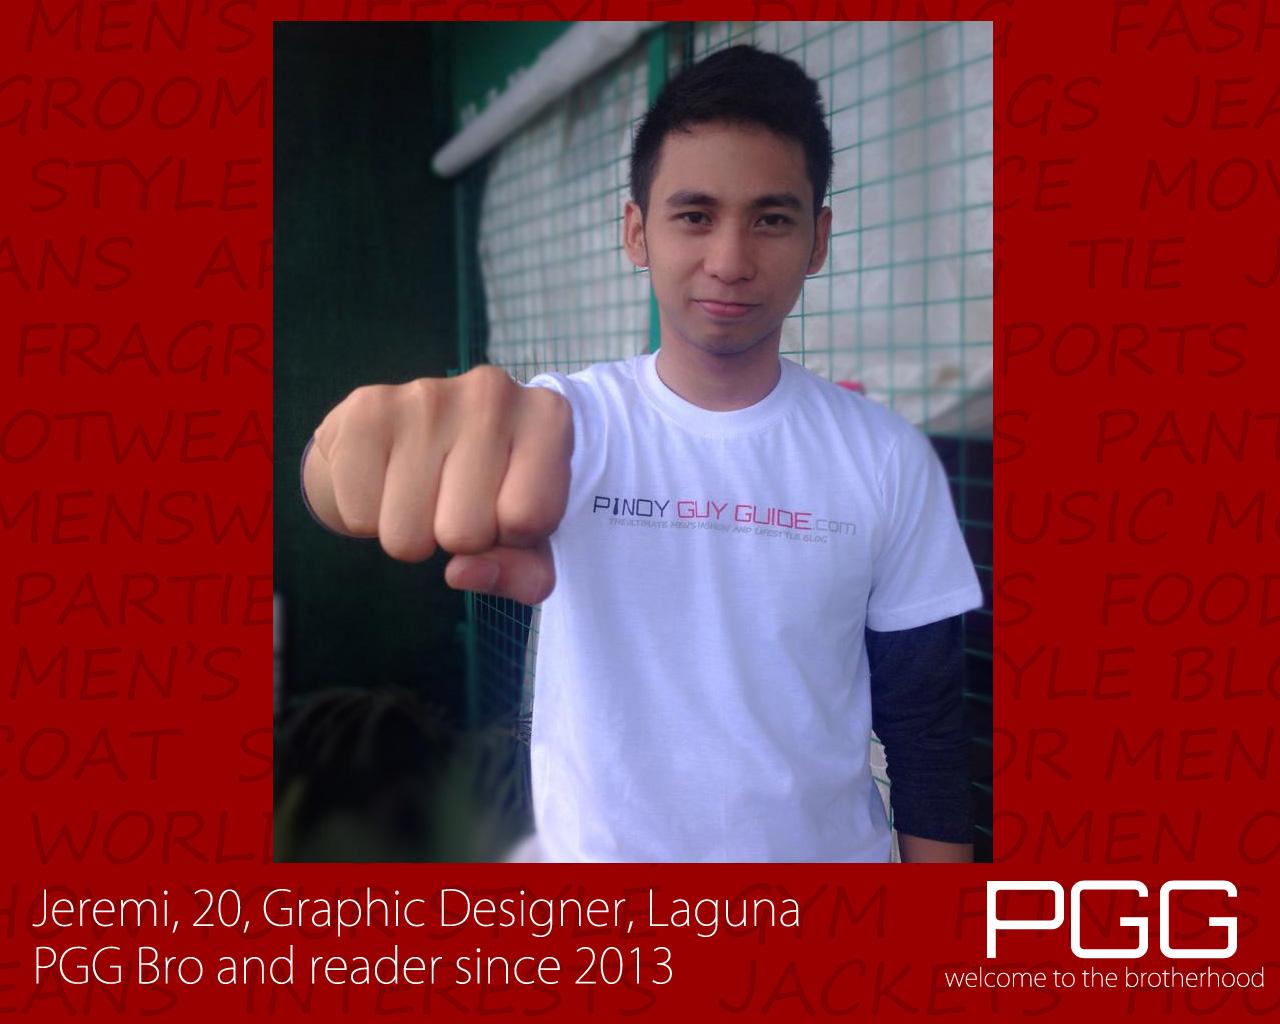 PGG Project Brotherhood - Jeremi